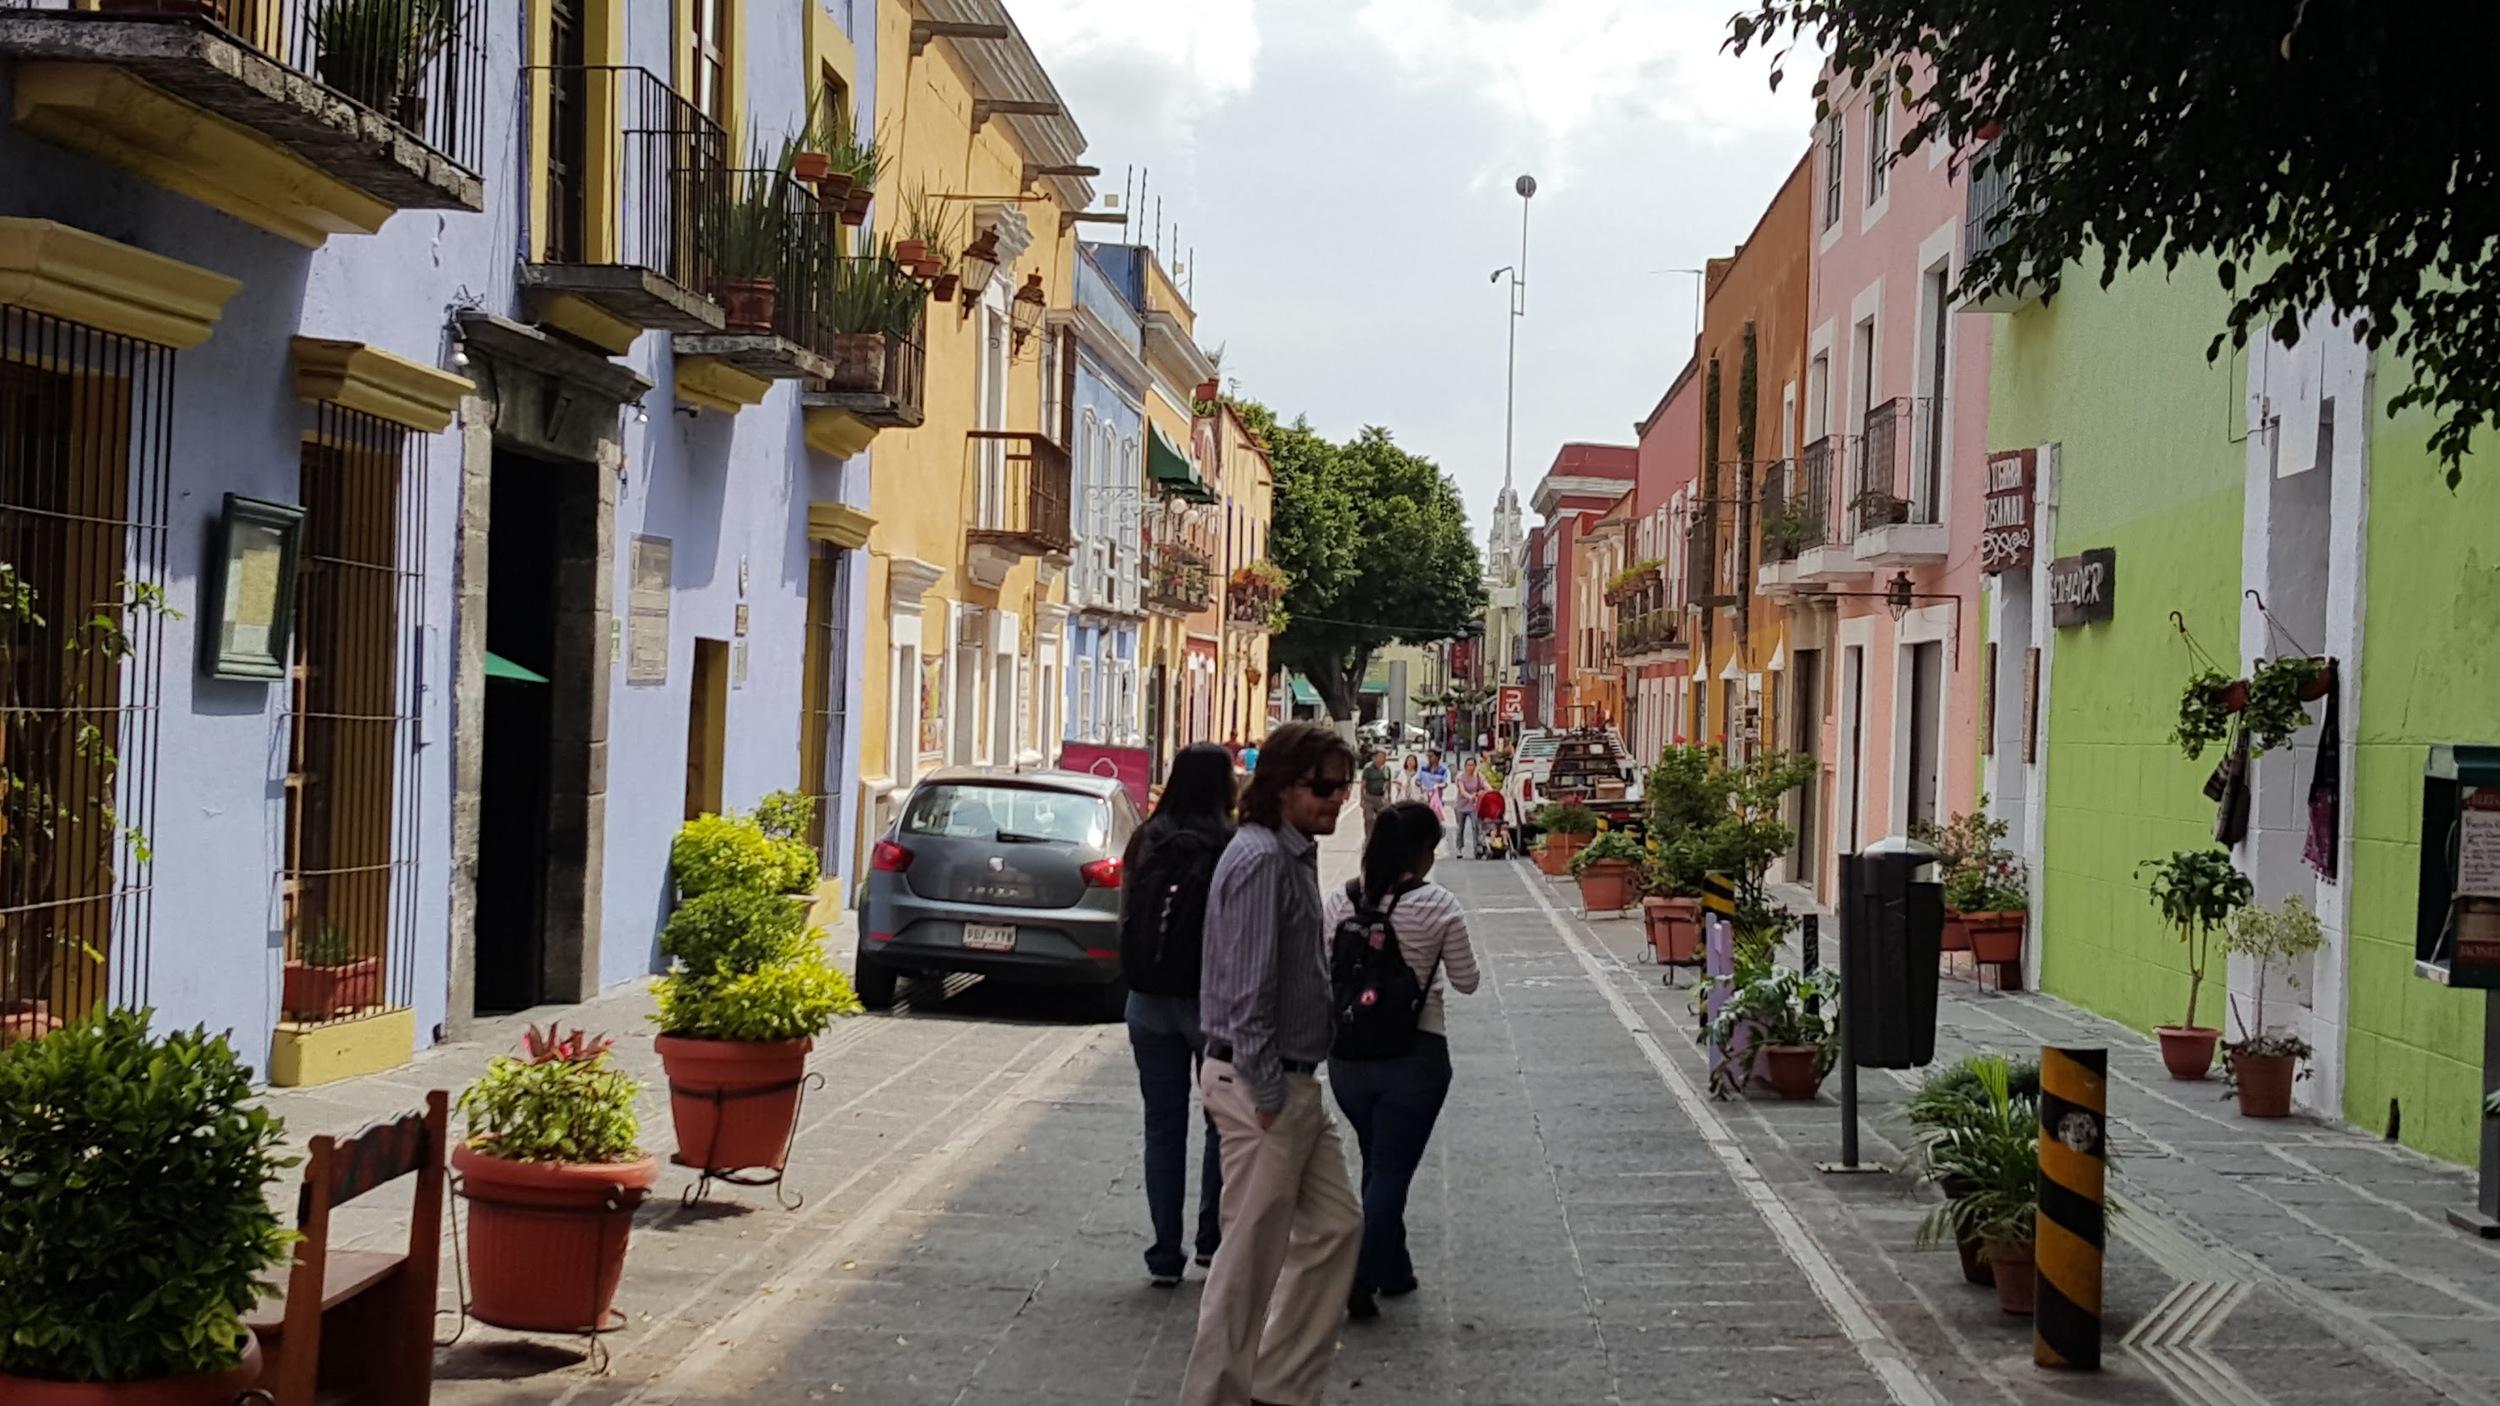 Another street in Puebla.